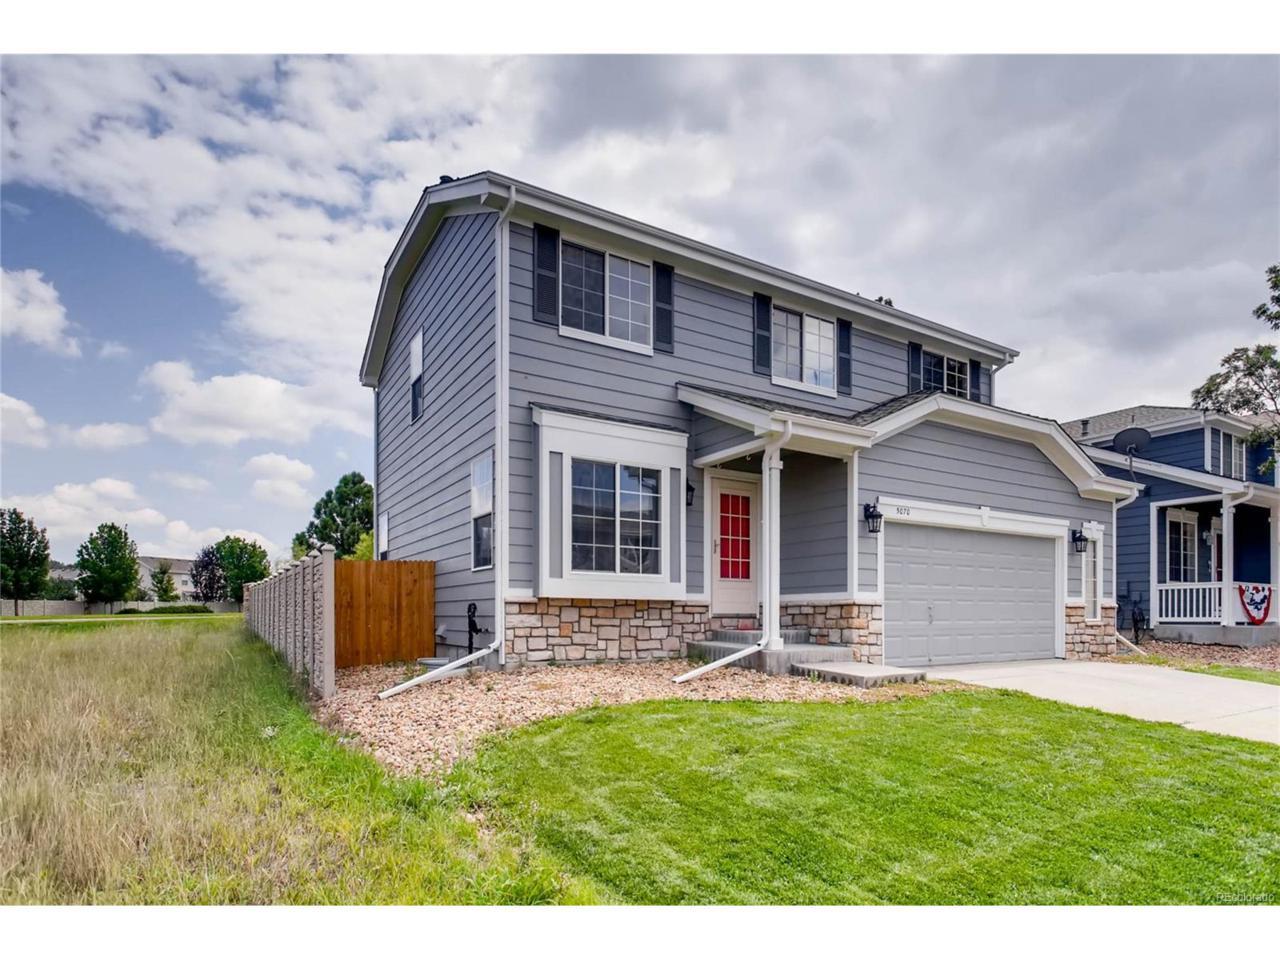 5070 Ox Trail, Parker, CO 80134 (MLS #7974807) :: 8z Real Estate